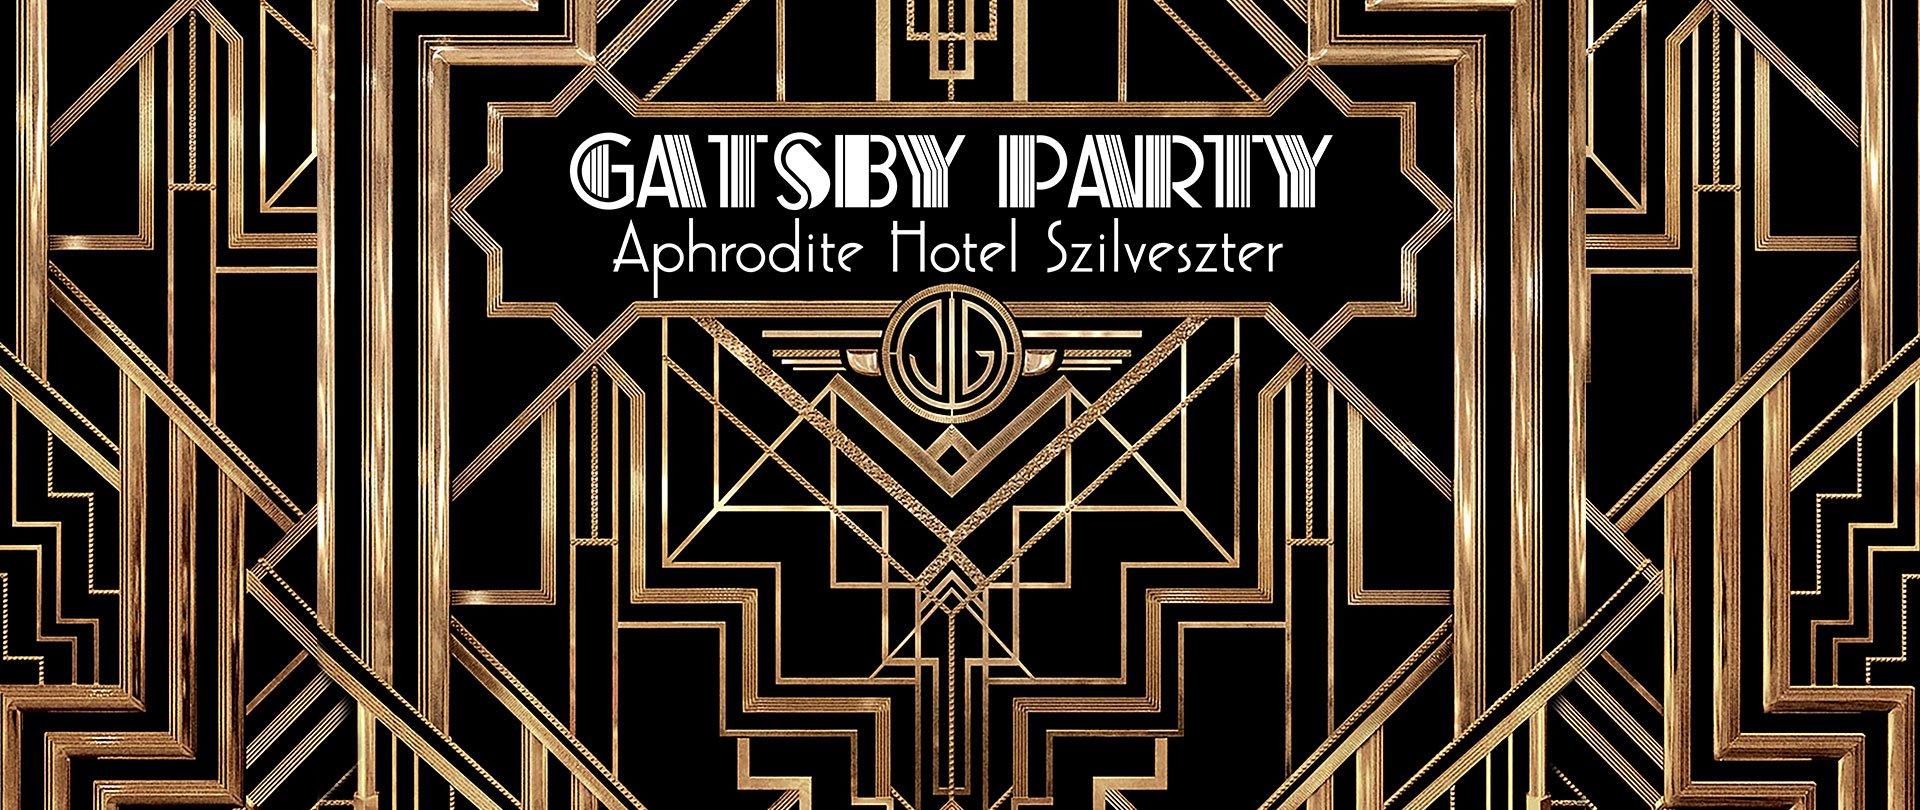 Gatsby Party Aphrodite Szilveszter